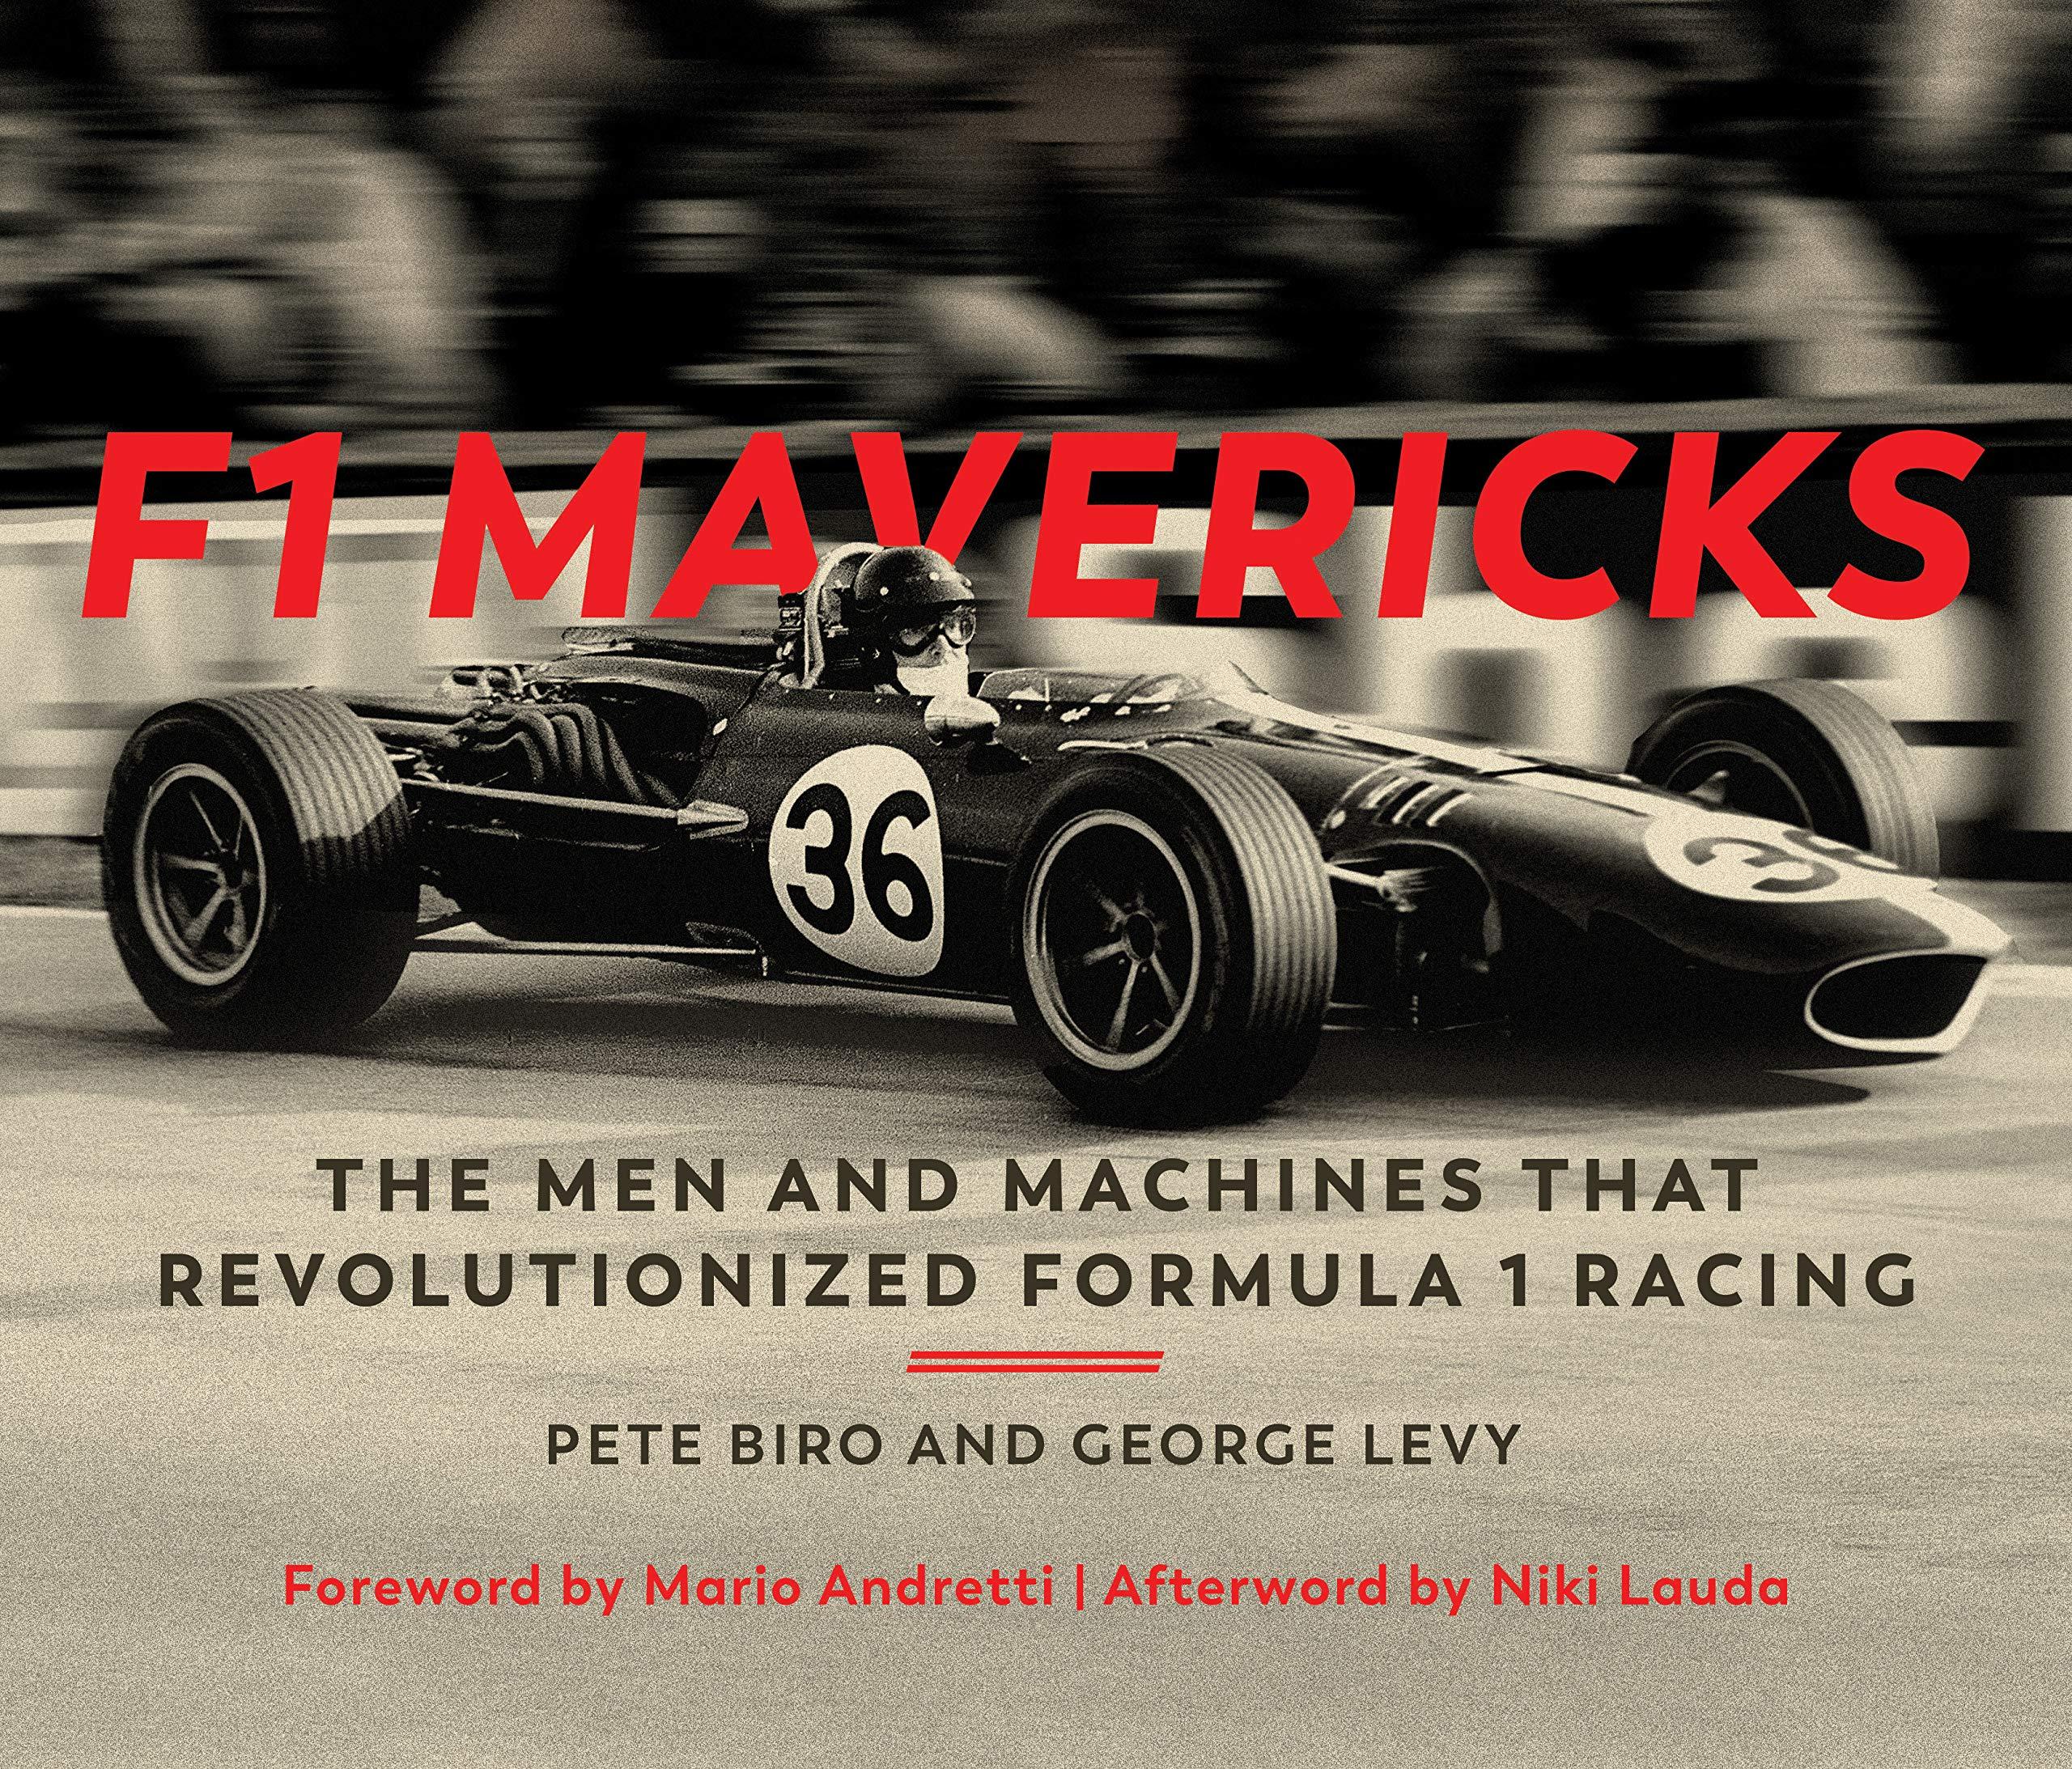 f1-maverick-soymotor.jpg